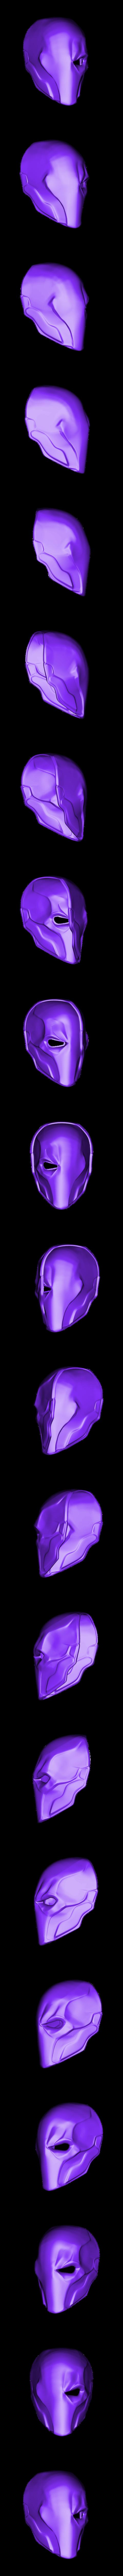 Deathstroke.stl Download free STL file Deathstroke Mask • 3D printable object, VillainousPropShop